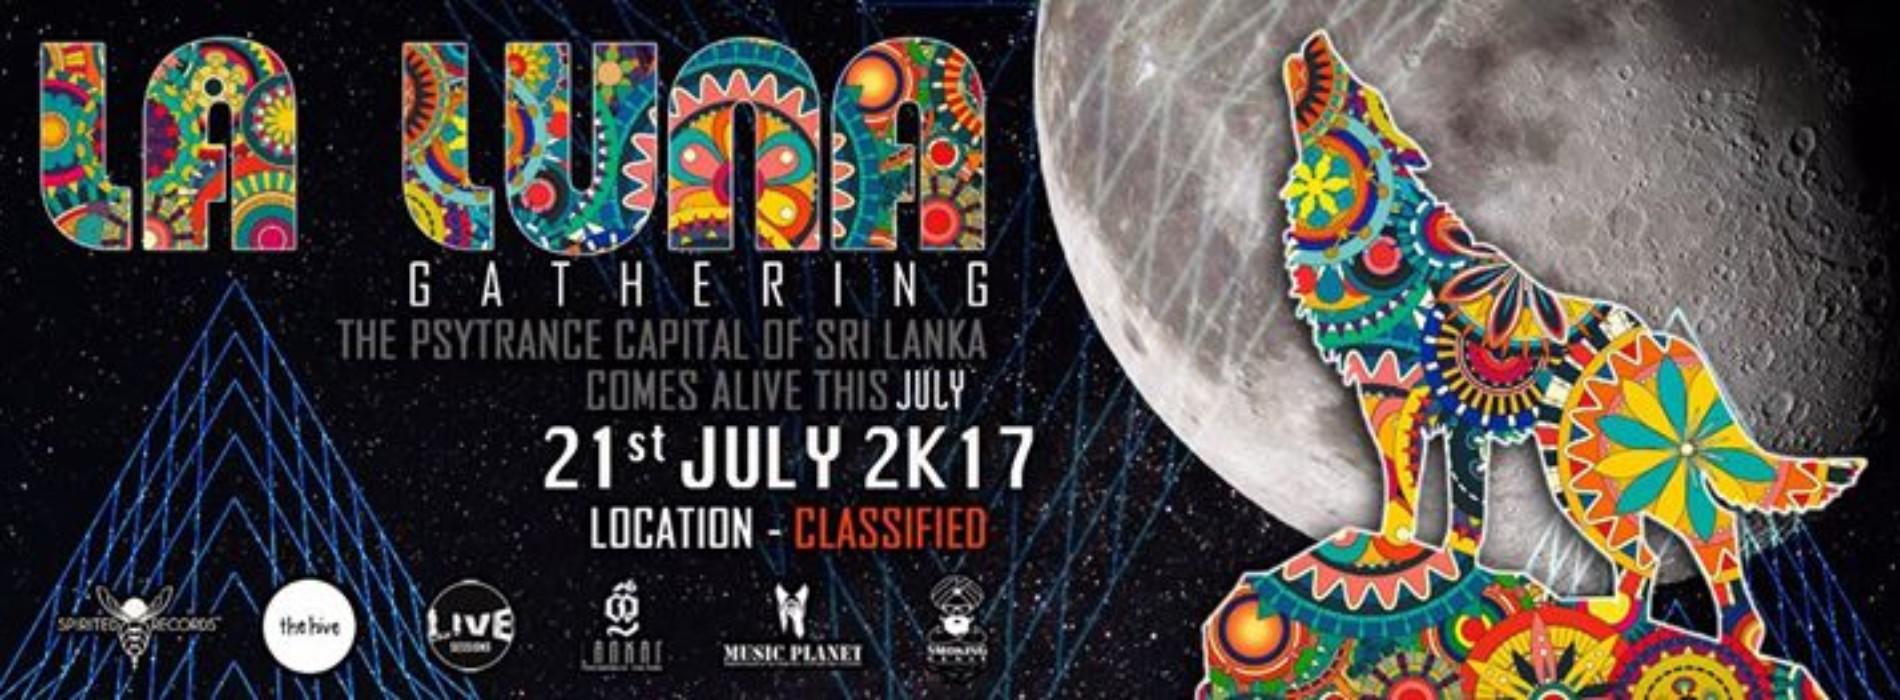 La Luna Gathering 2017